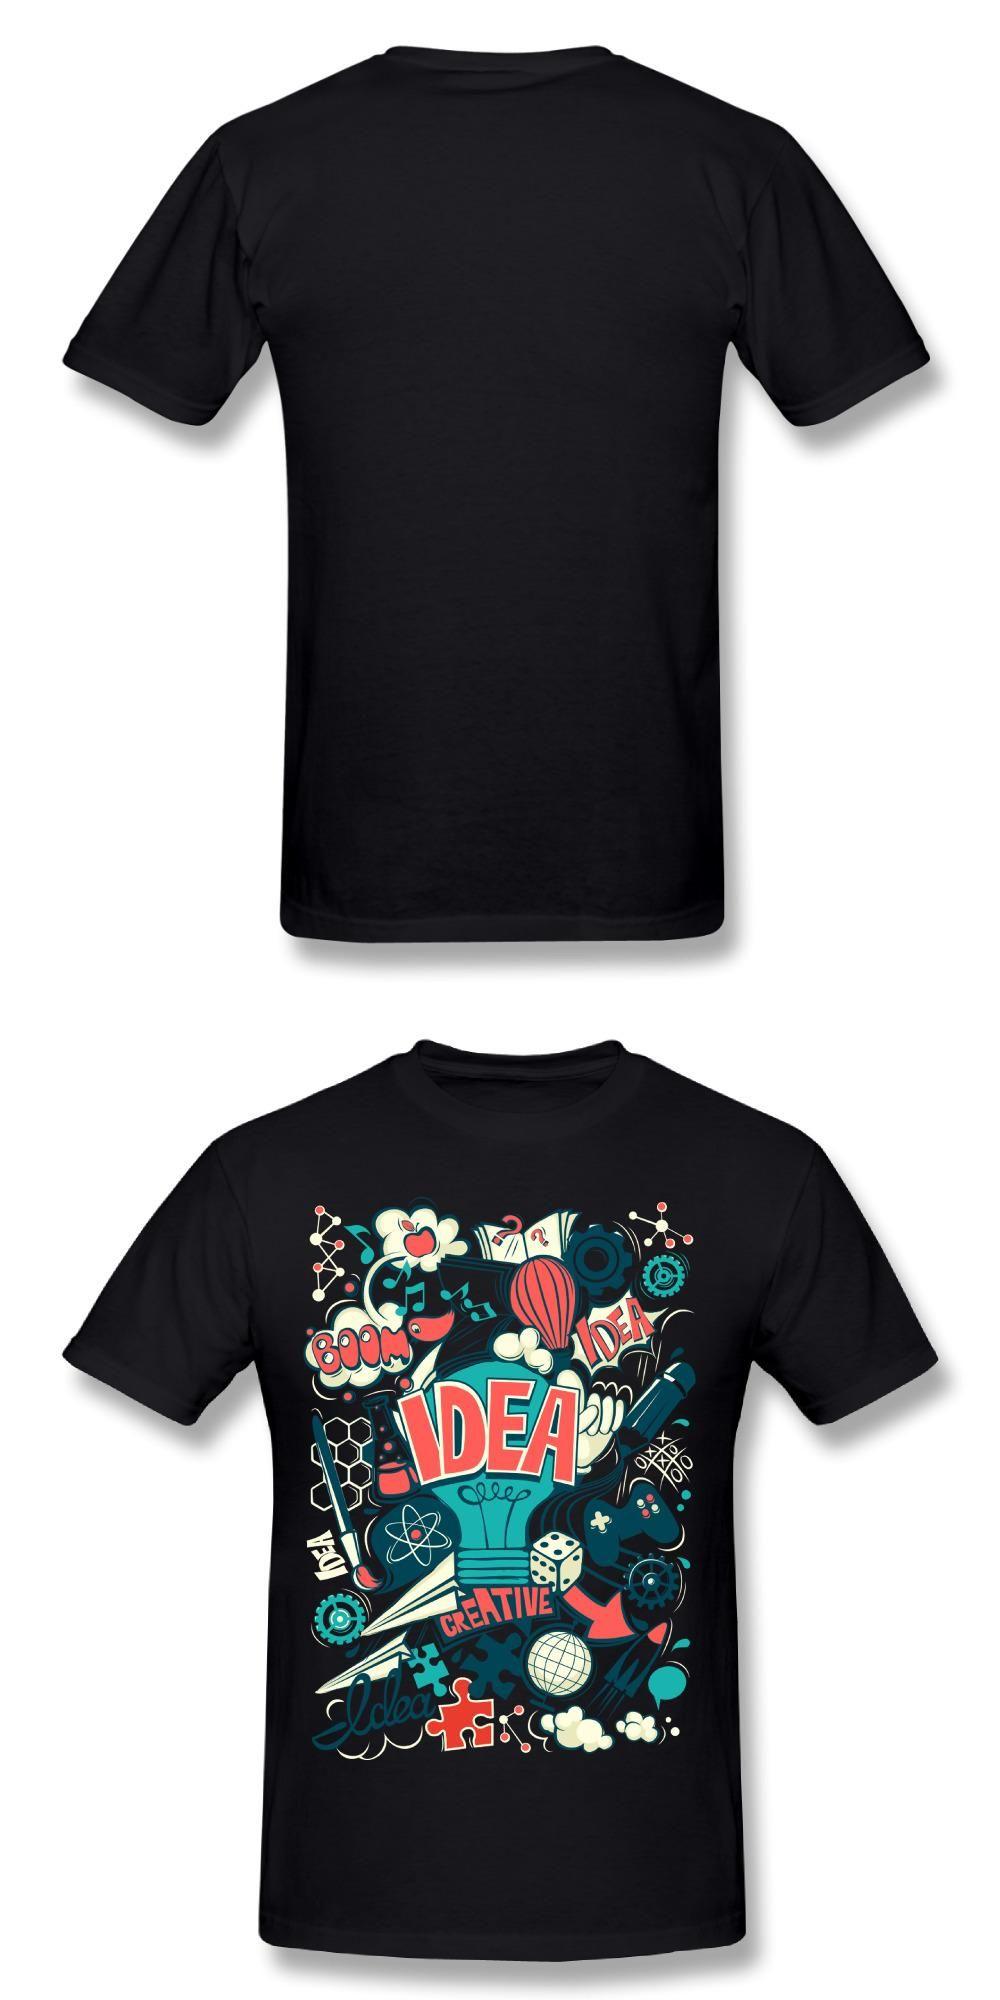 5509bddc Men T Shirt 3D Men Fashion T-shirt Idea Streetwear Tshirt Men Funny T  Shirts Mens Shirts Clothing